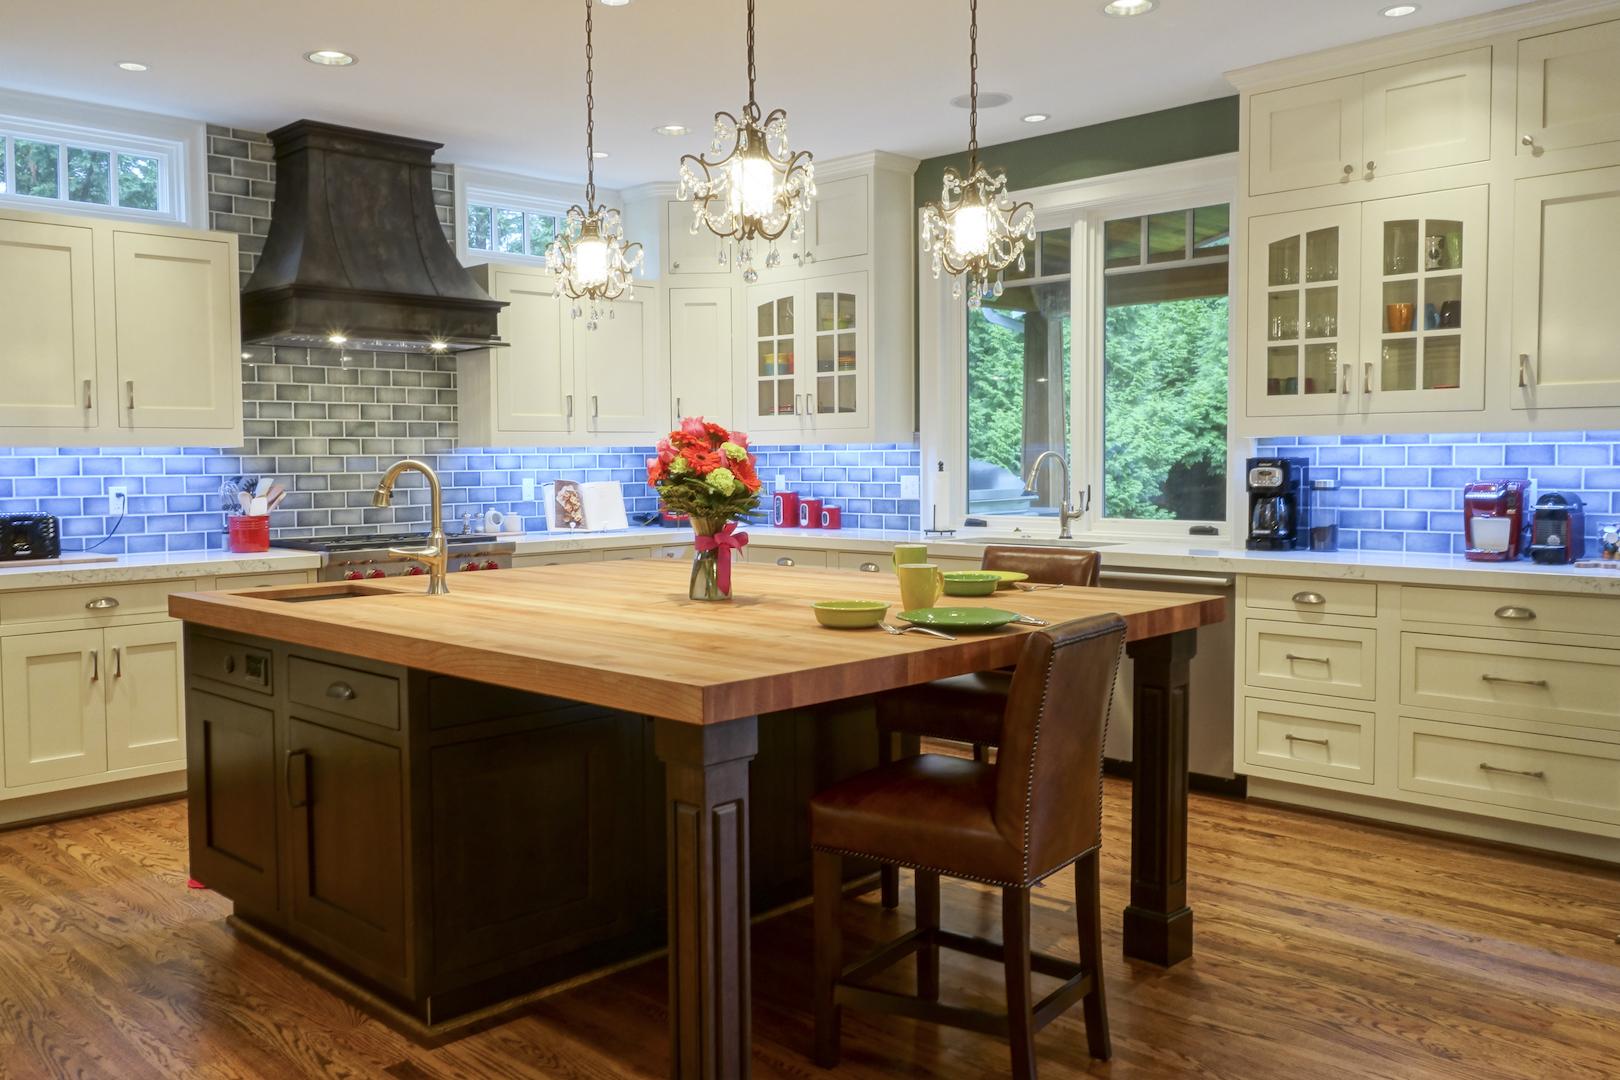 Kitchen-1g.jpeg